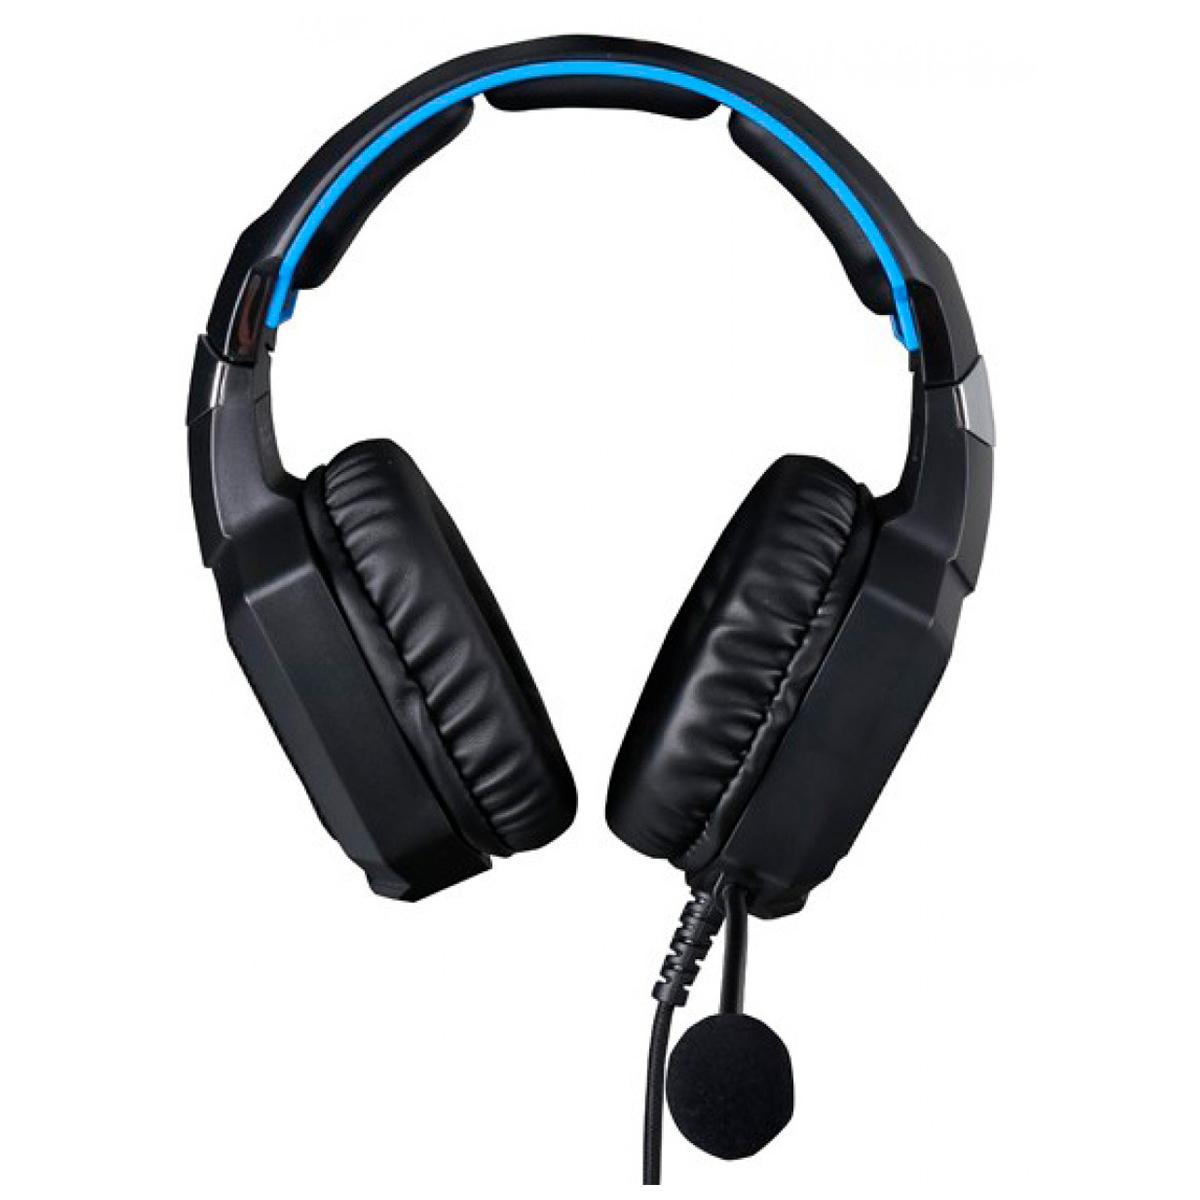 Headset Gamer HP H320 Stereo P2 3.5mm + USB Driver 50mm LED